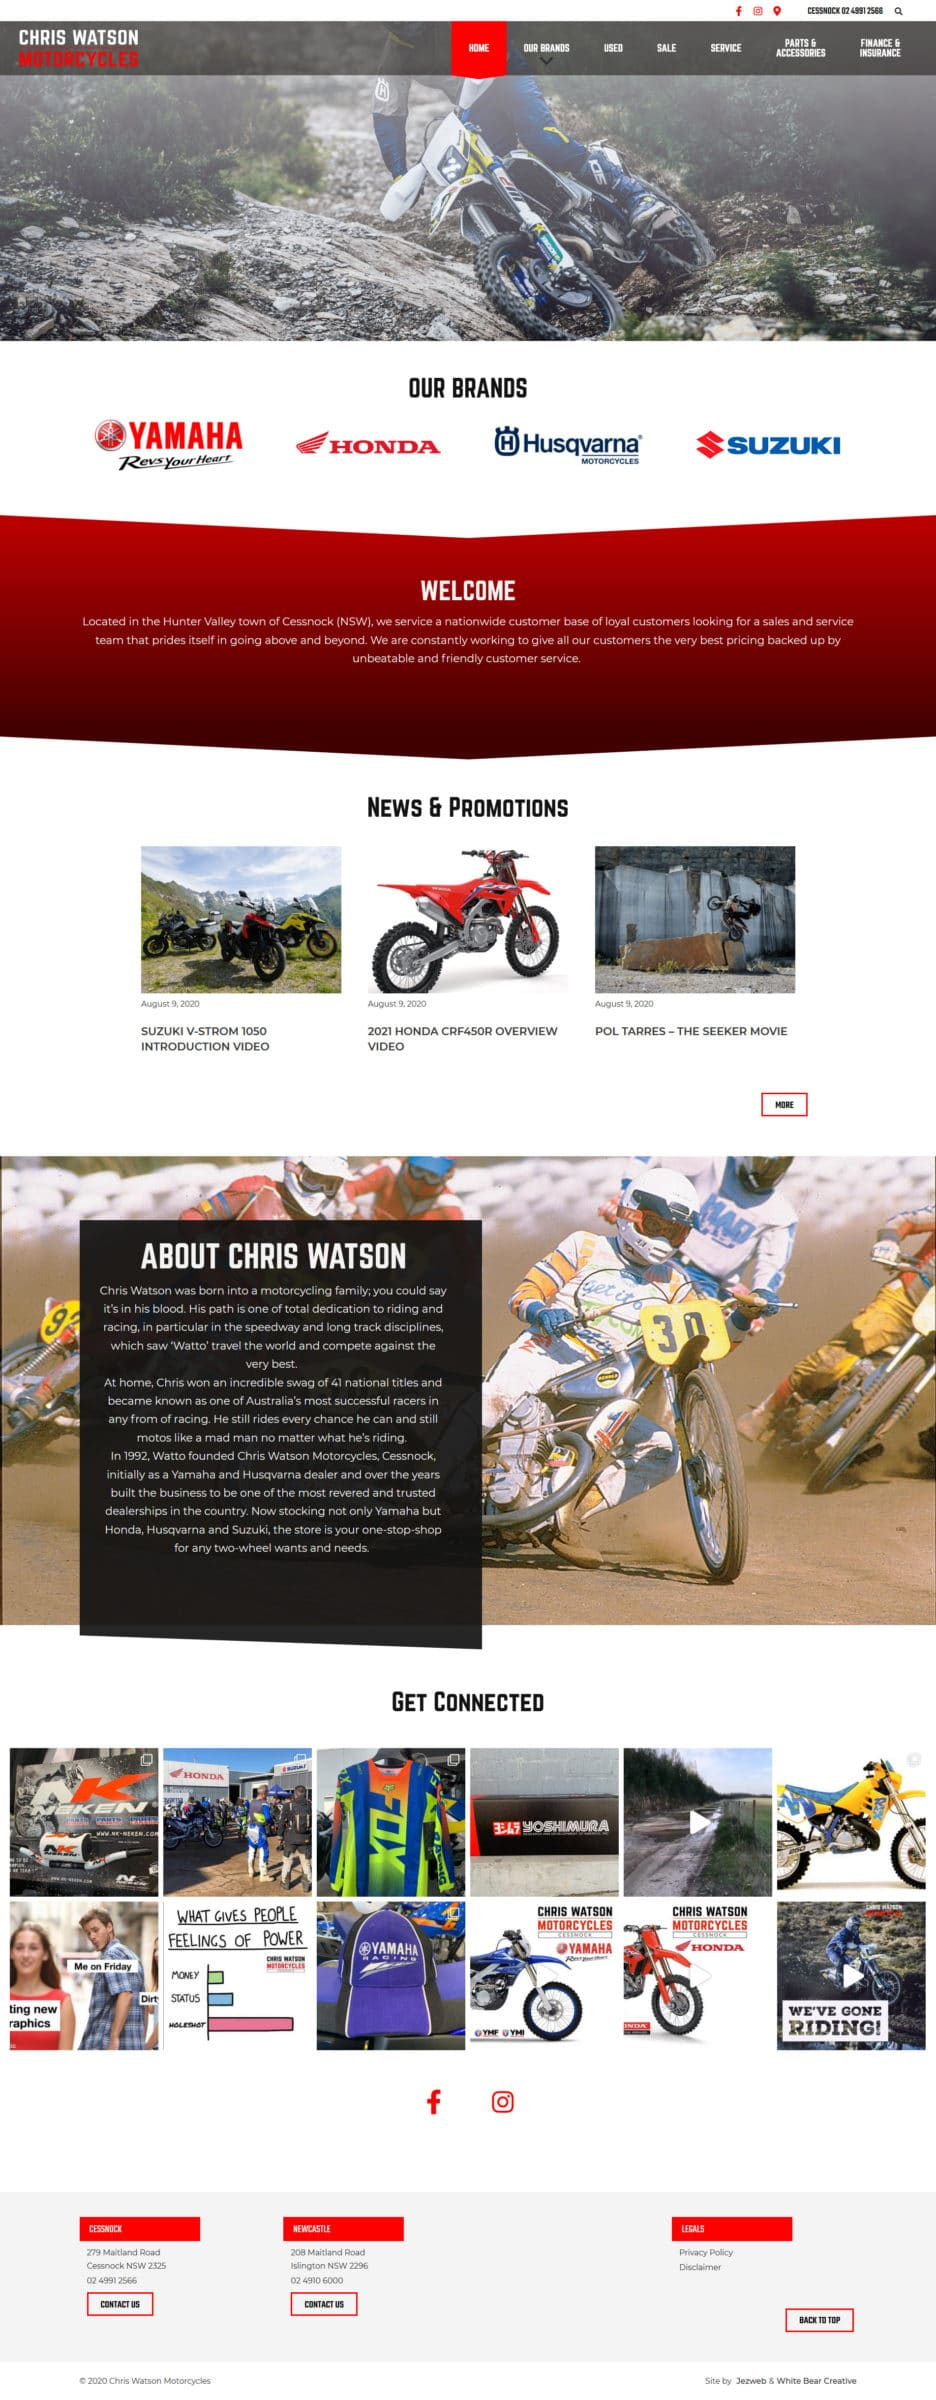 Chris Watson Motorcycles -